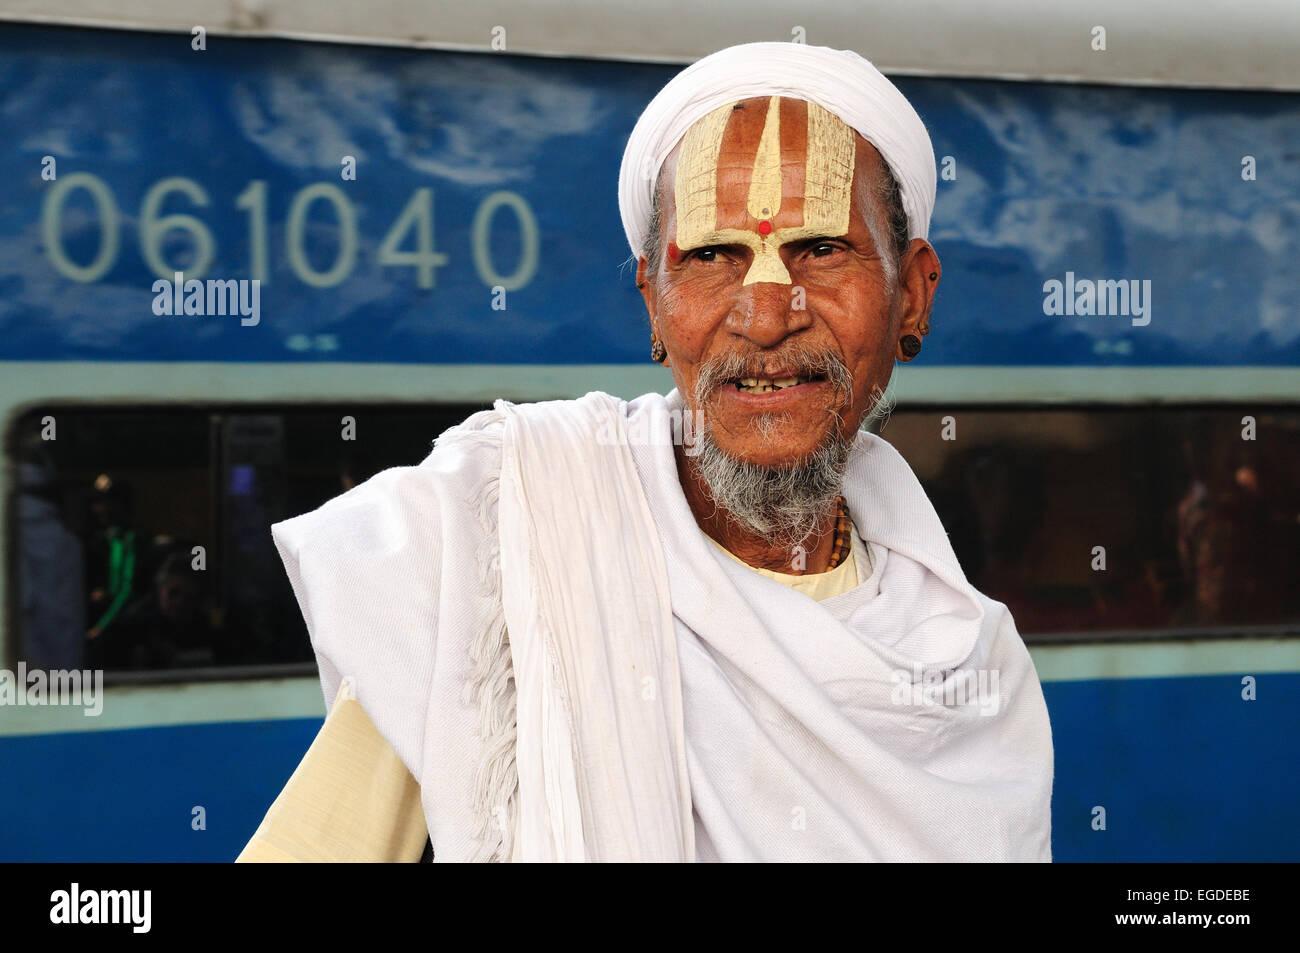 A Vishnu Devotee Sadhu Indian Holy Man at Delhi Railway Station India - Stock Image